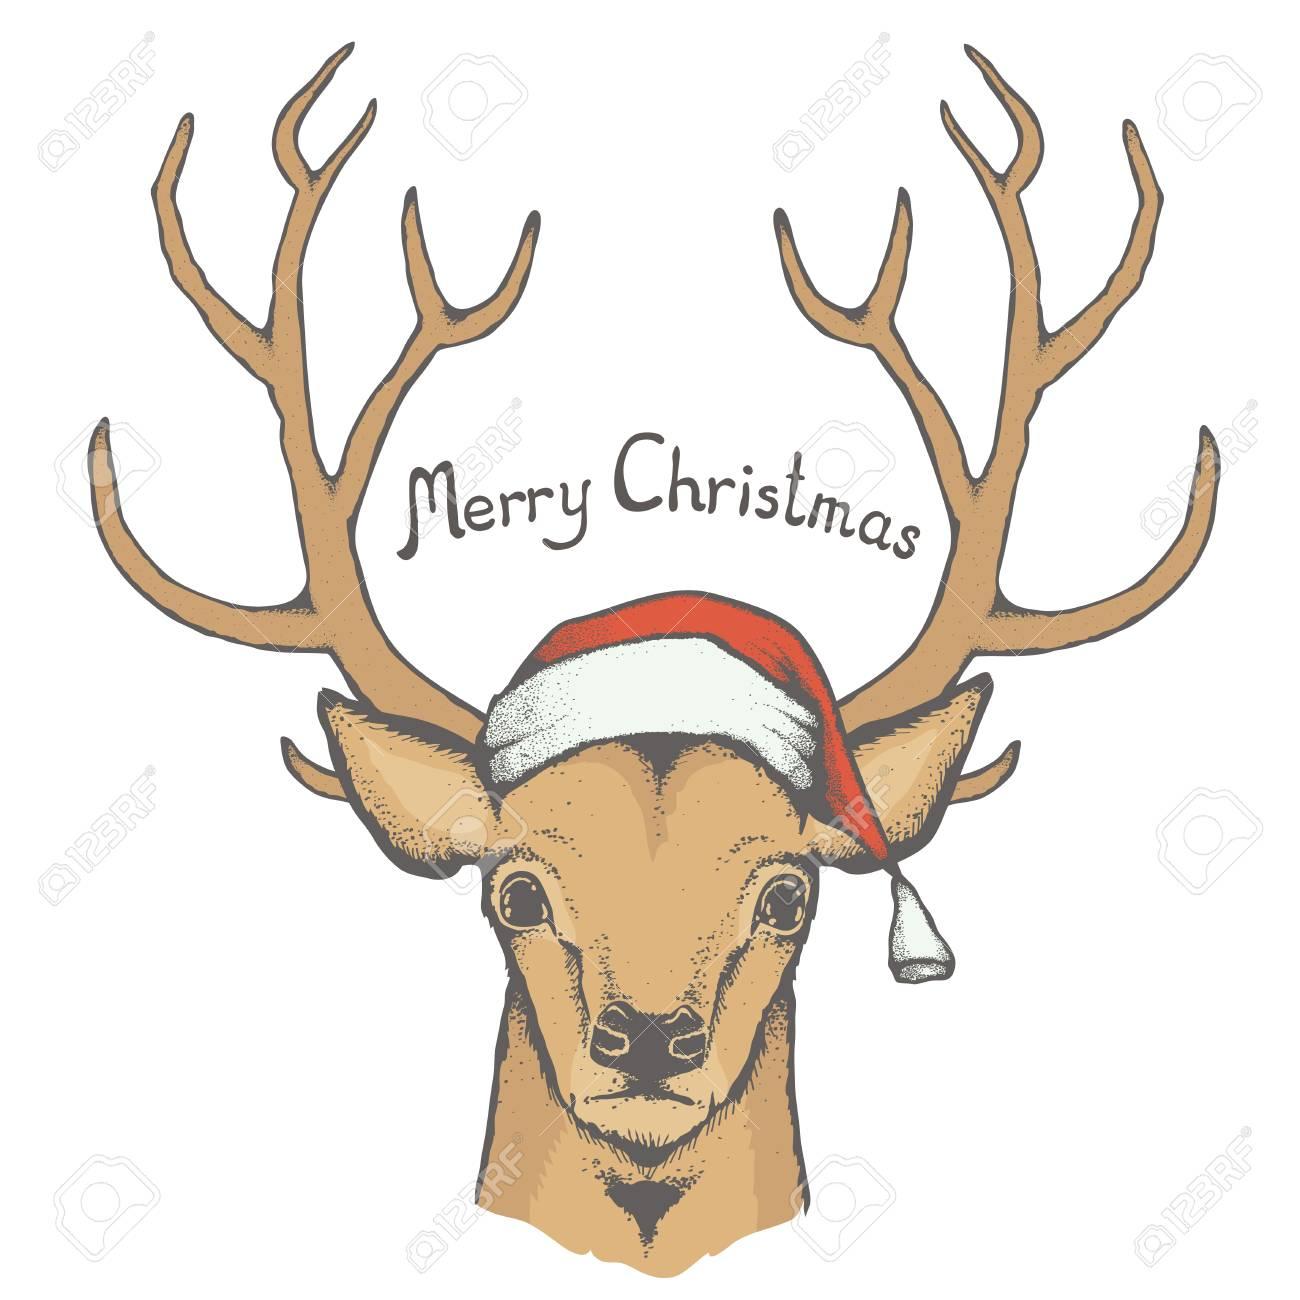 Christmas Deer Vector Illustration Reindeer Head With Horn And Santa Hat Inscription Merry